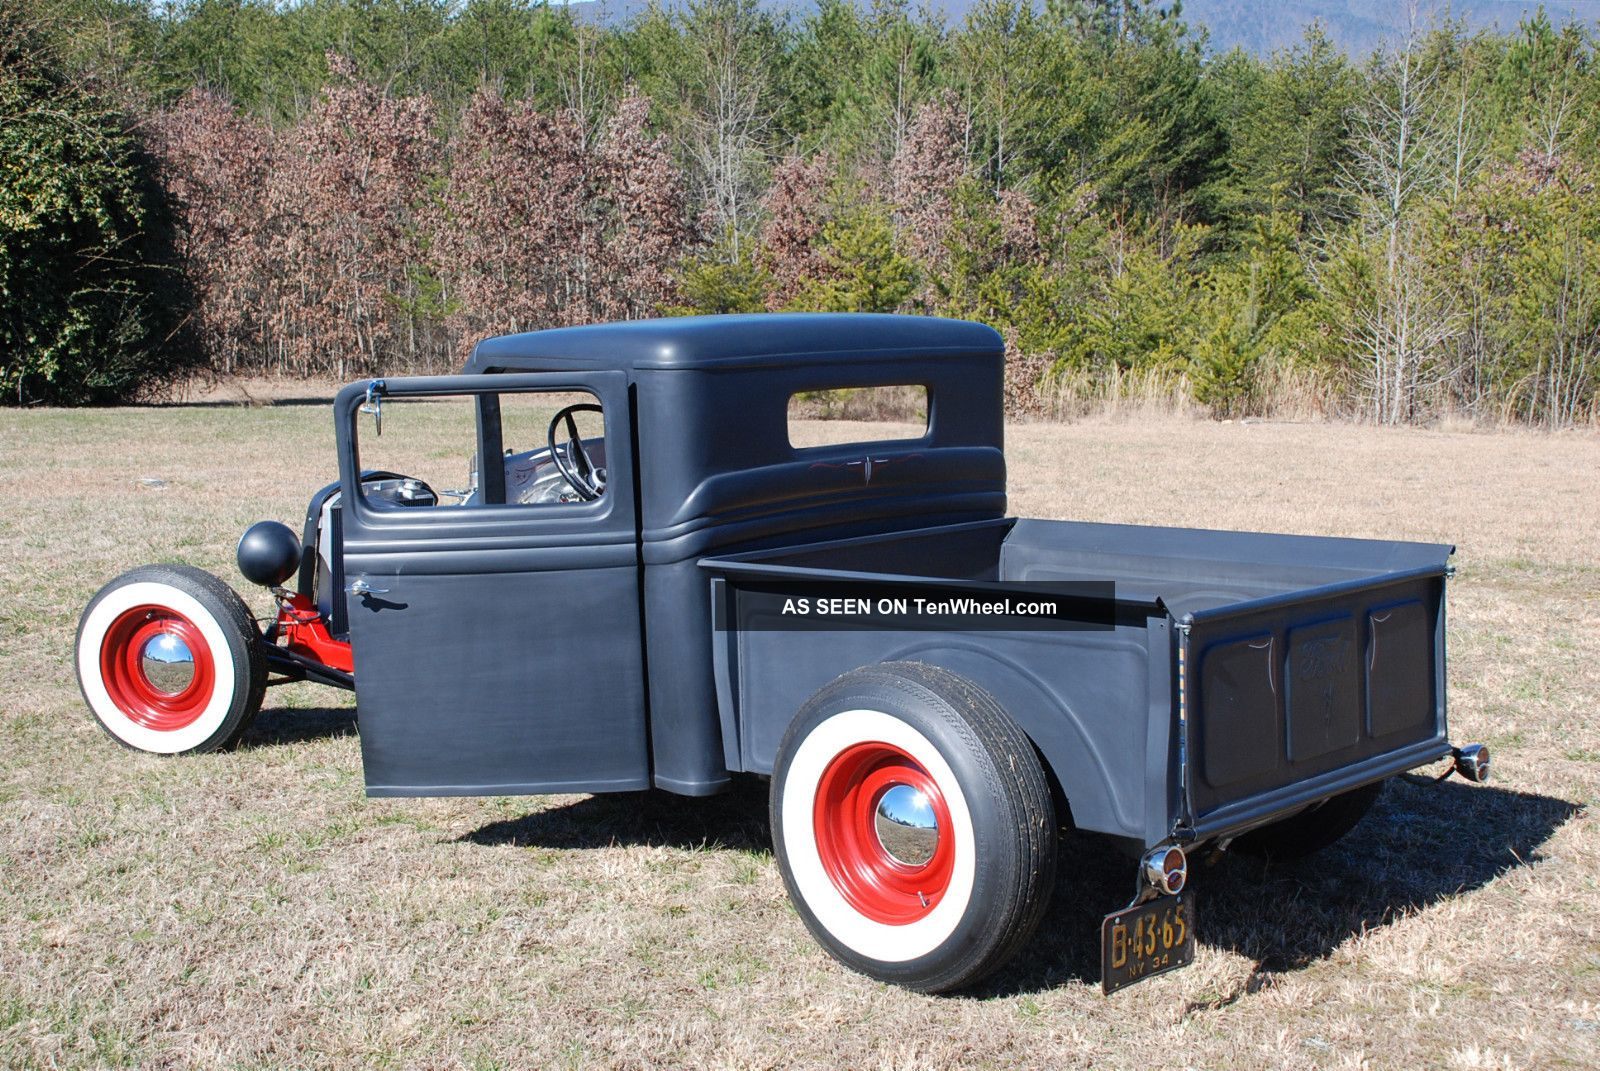 1934 Ford Truck Chopped Channeled Rpu Rat Hot Rod 350 Modified Custom Old Skool